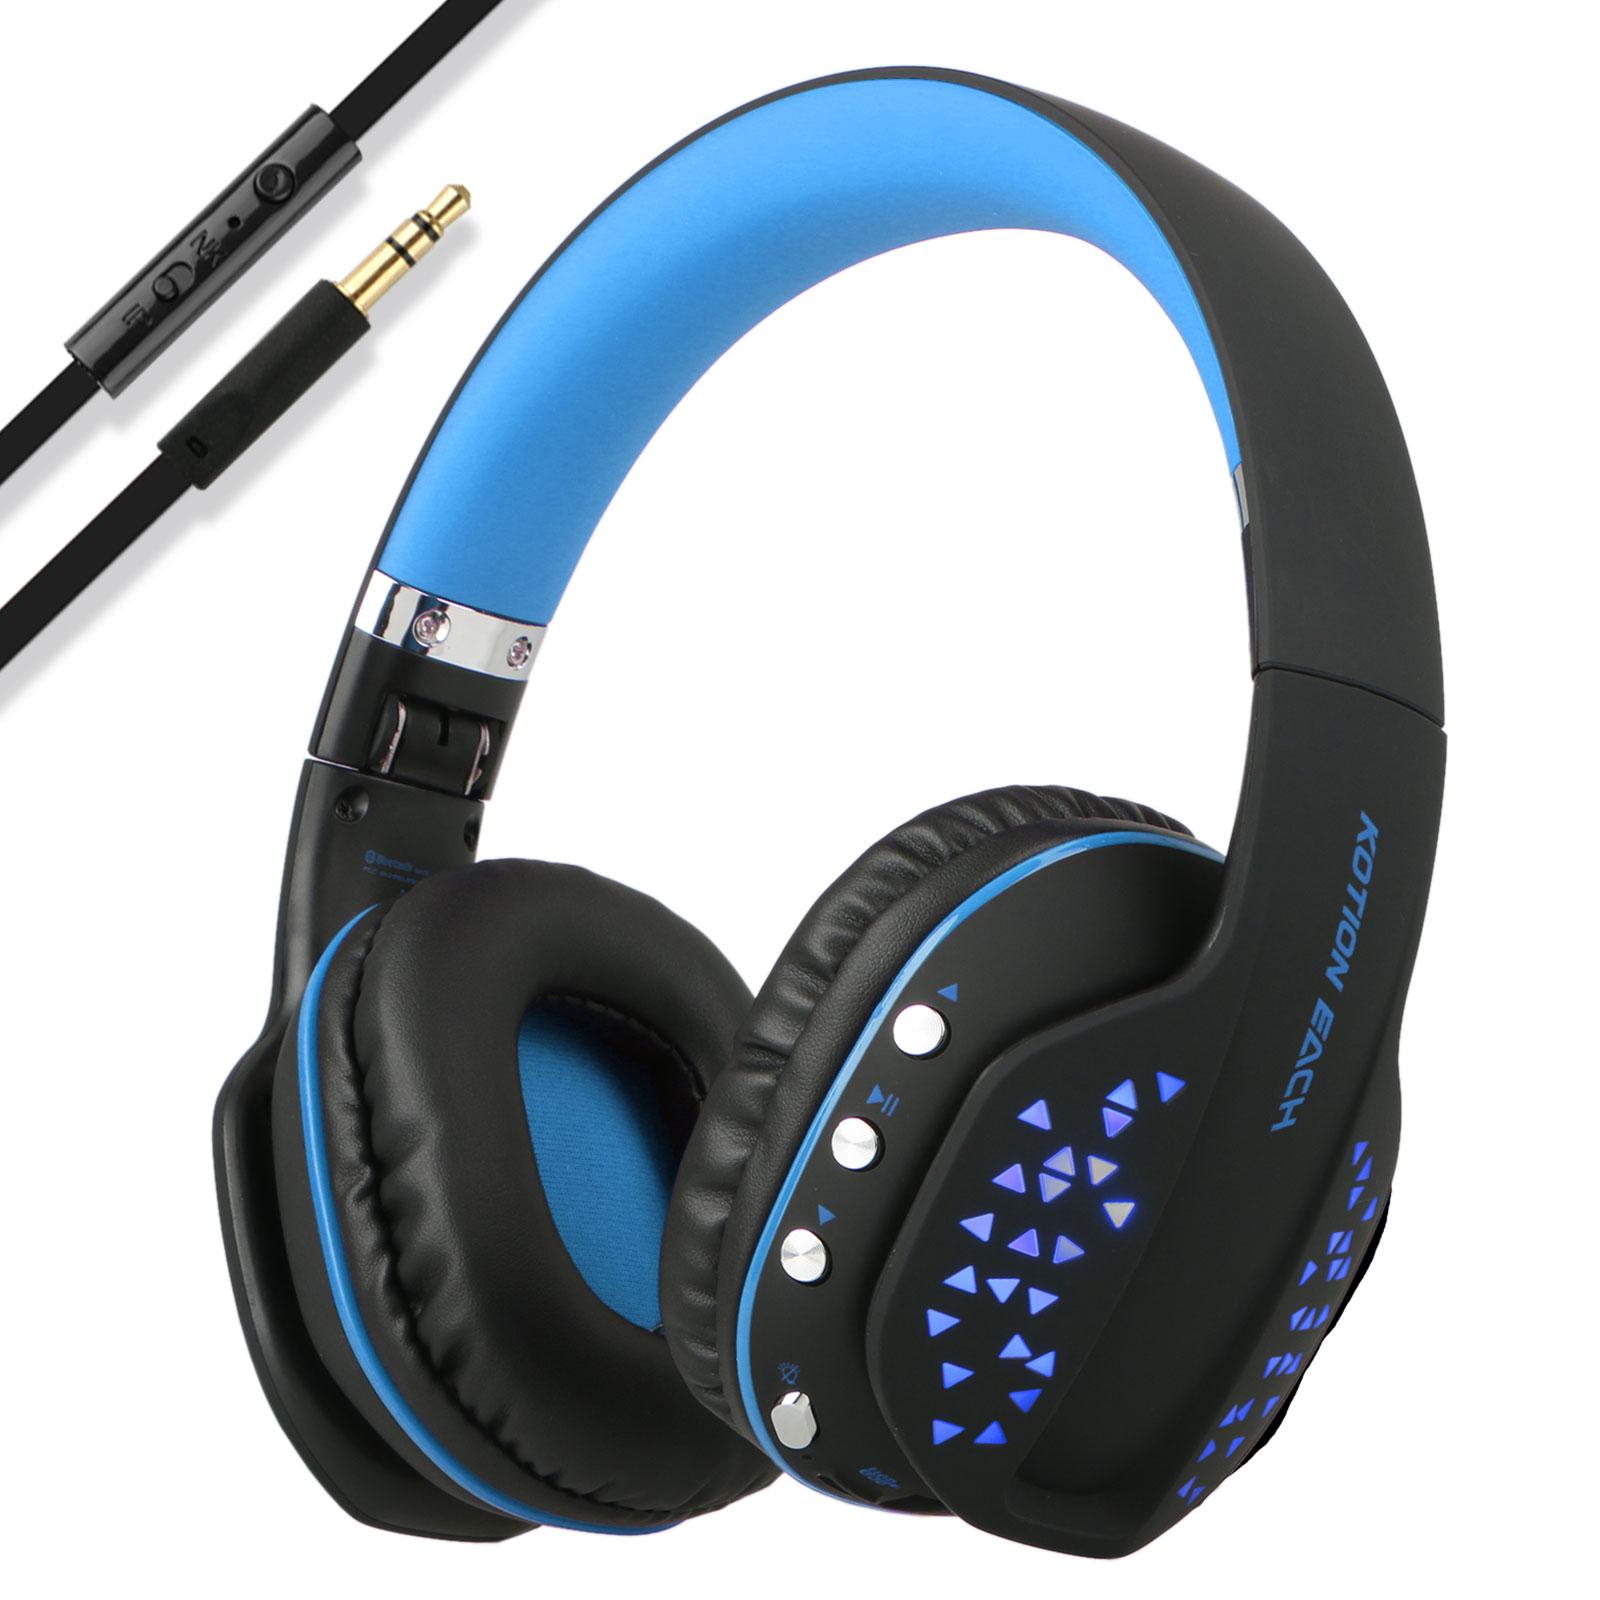 bluetooth wireless gaming headset stereo headphone usb 3. Black Bedroom Furniture Sets. Home Design Ideas